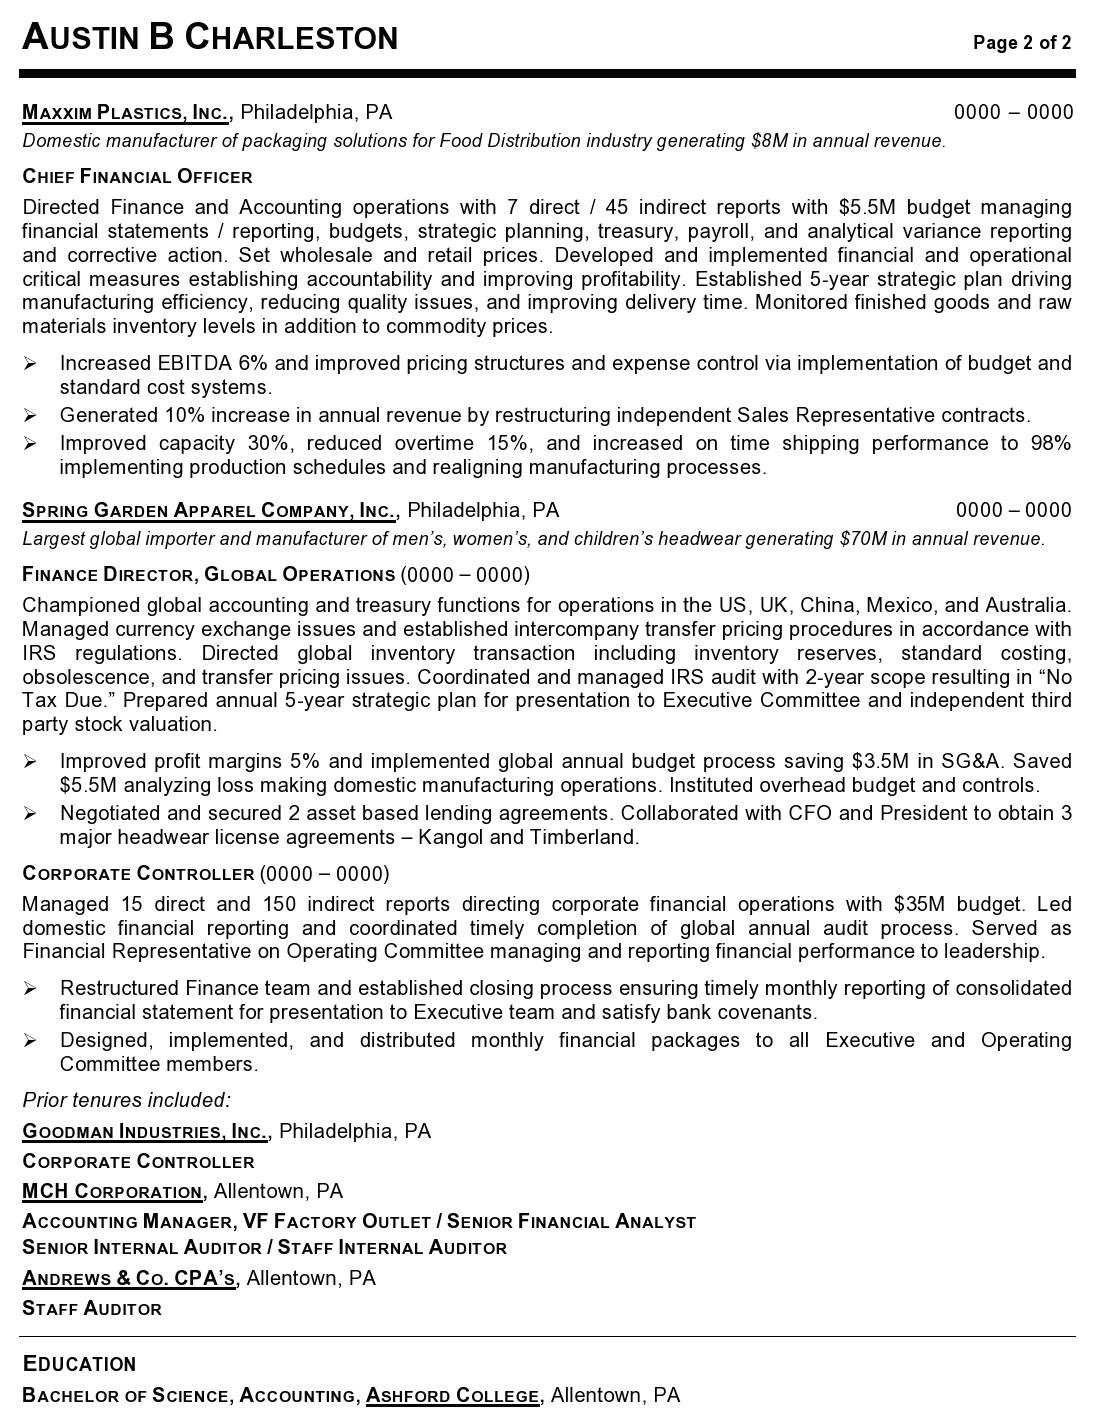 resume sample vice president operations